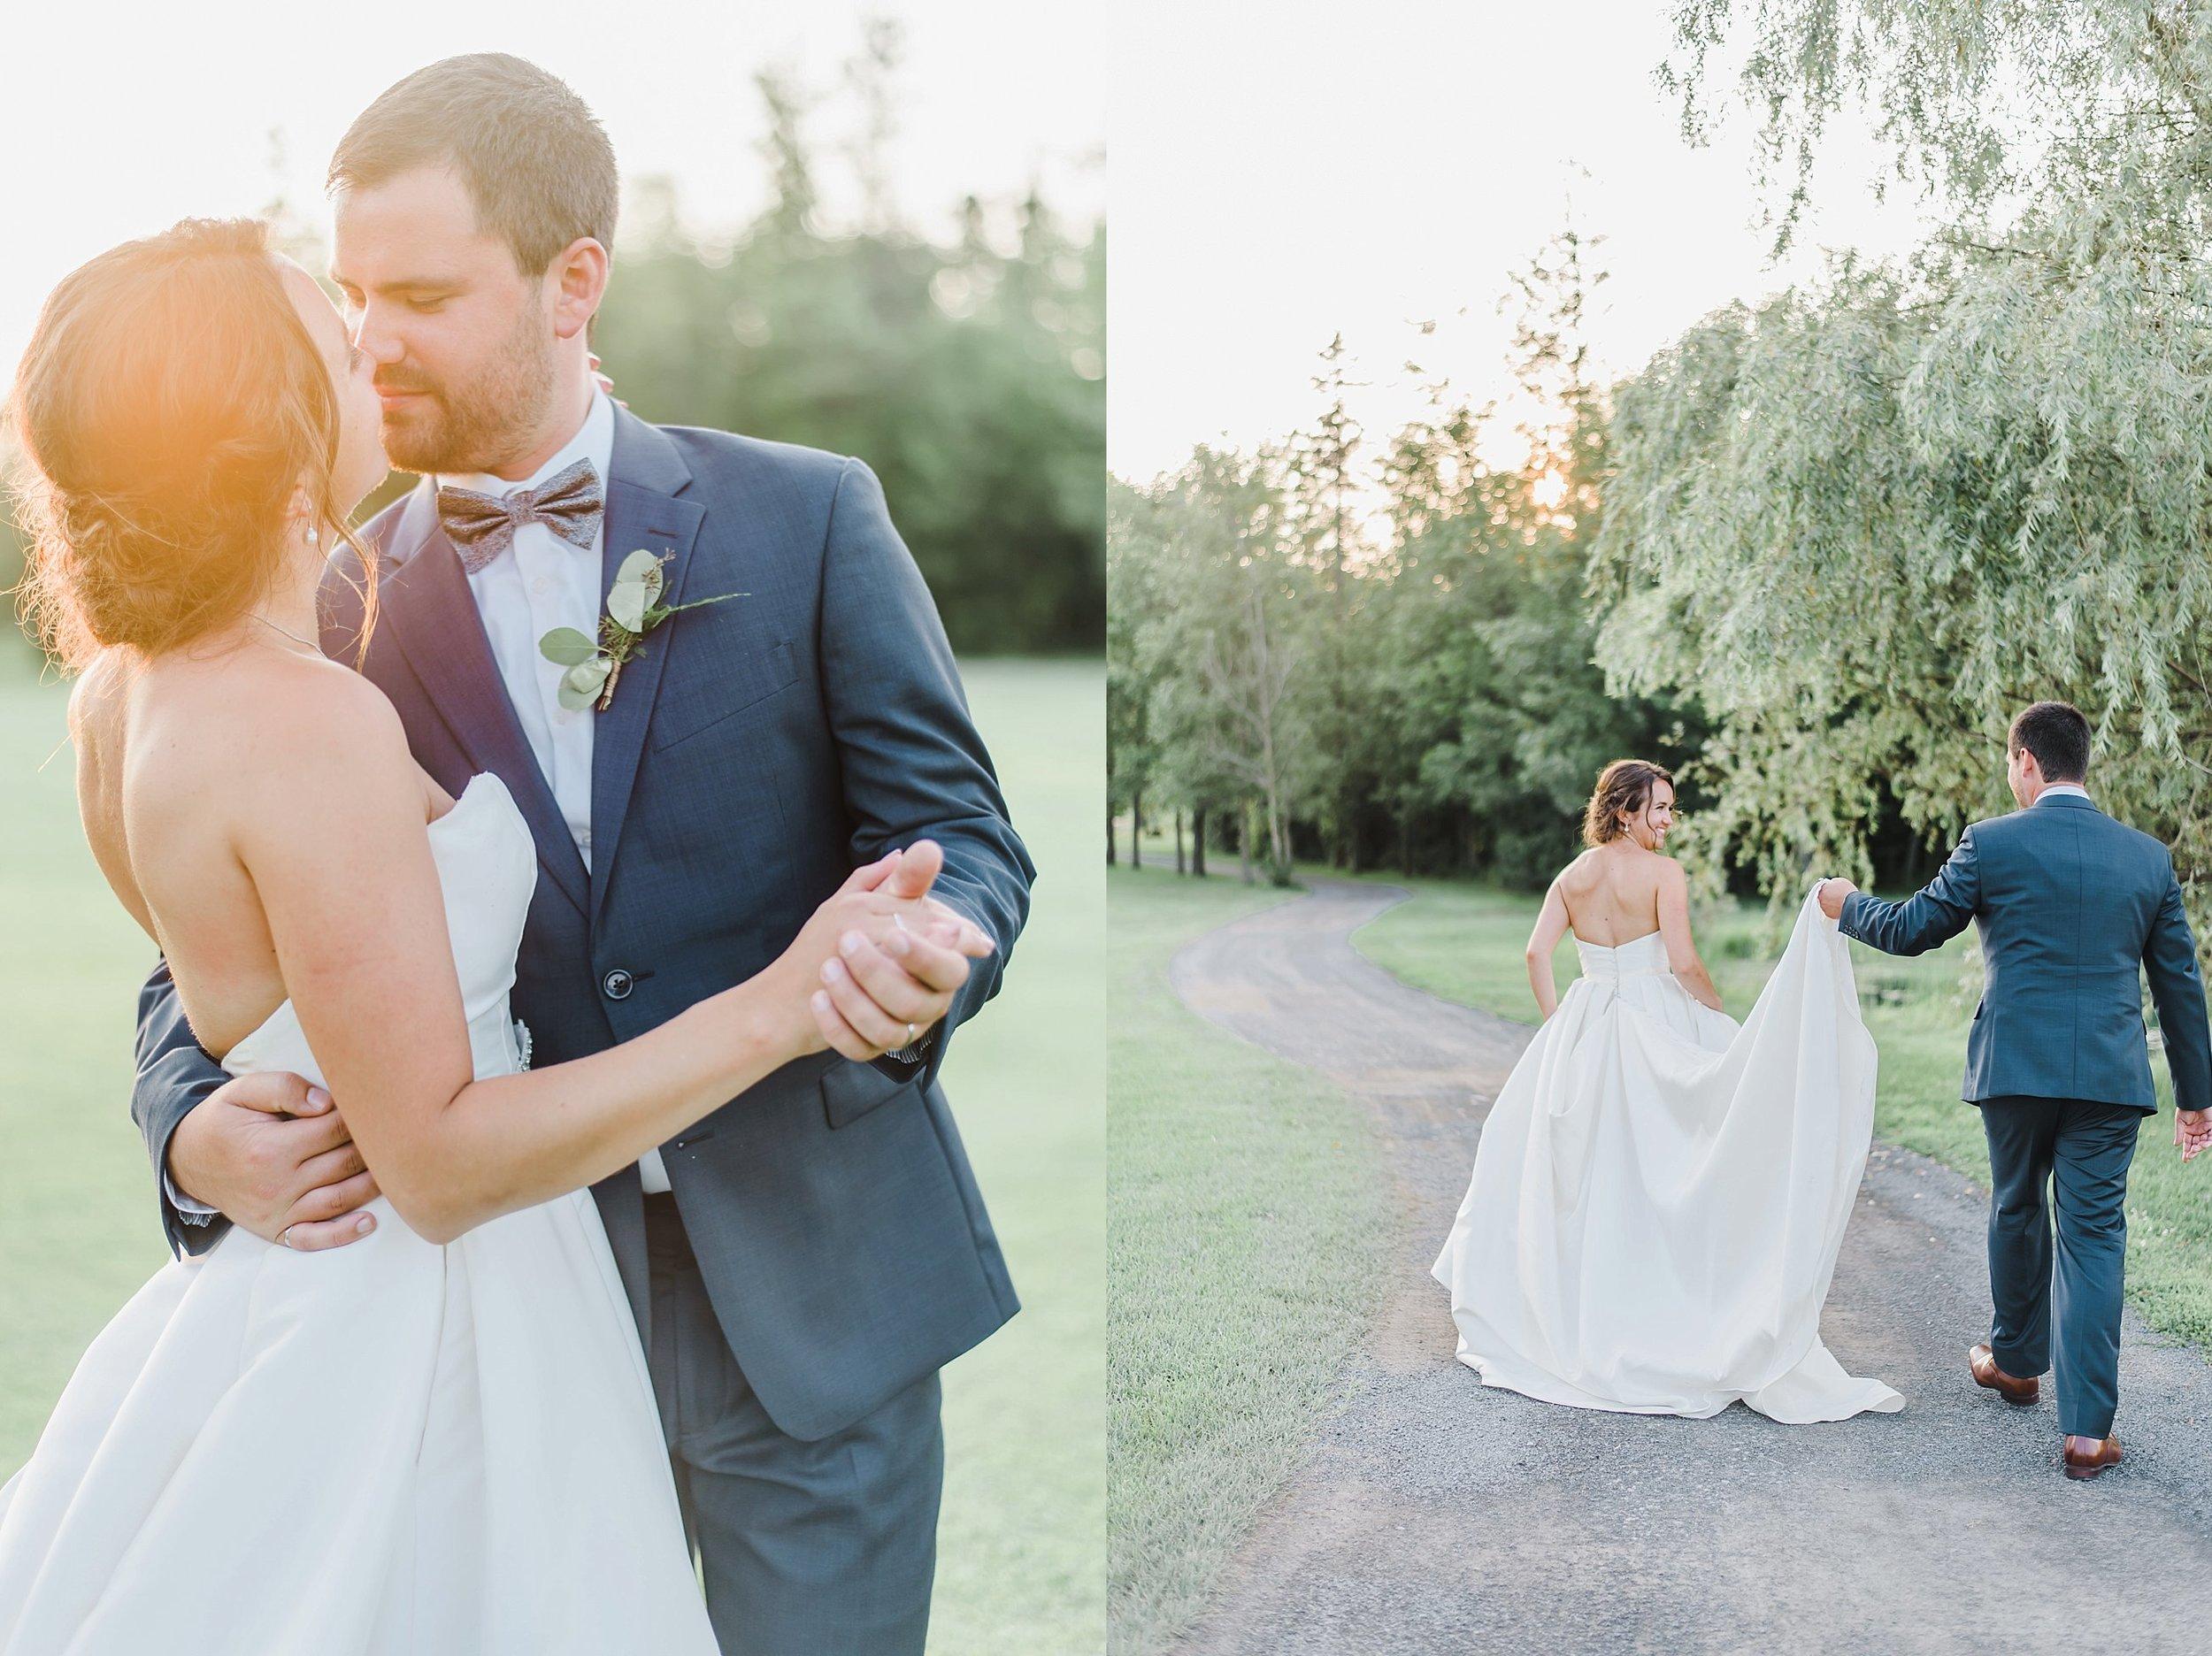 light airy indie fine art ottawa wedding photographer | Ali and Batoul Photography_0572.jpg